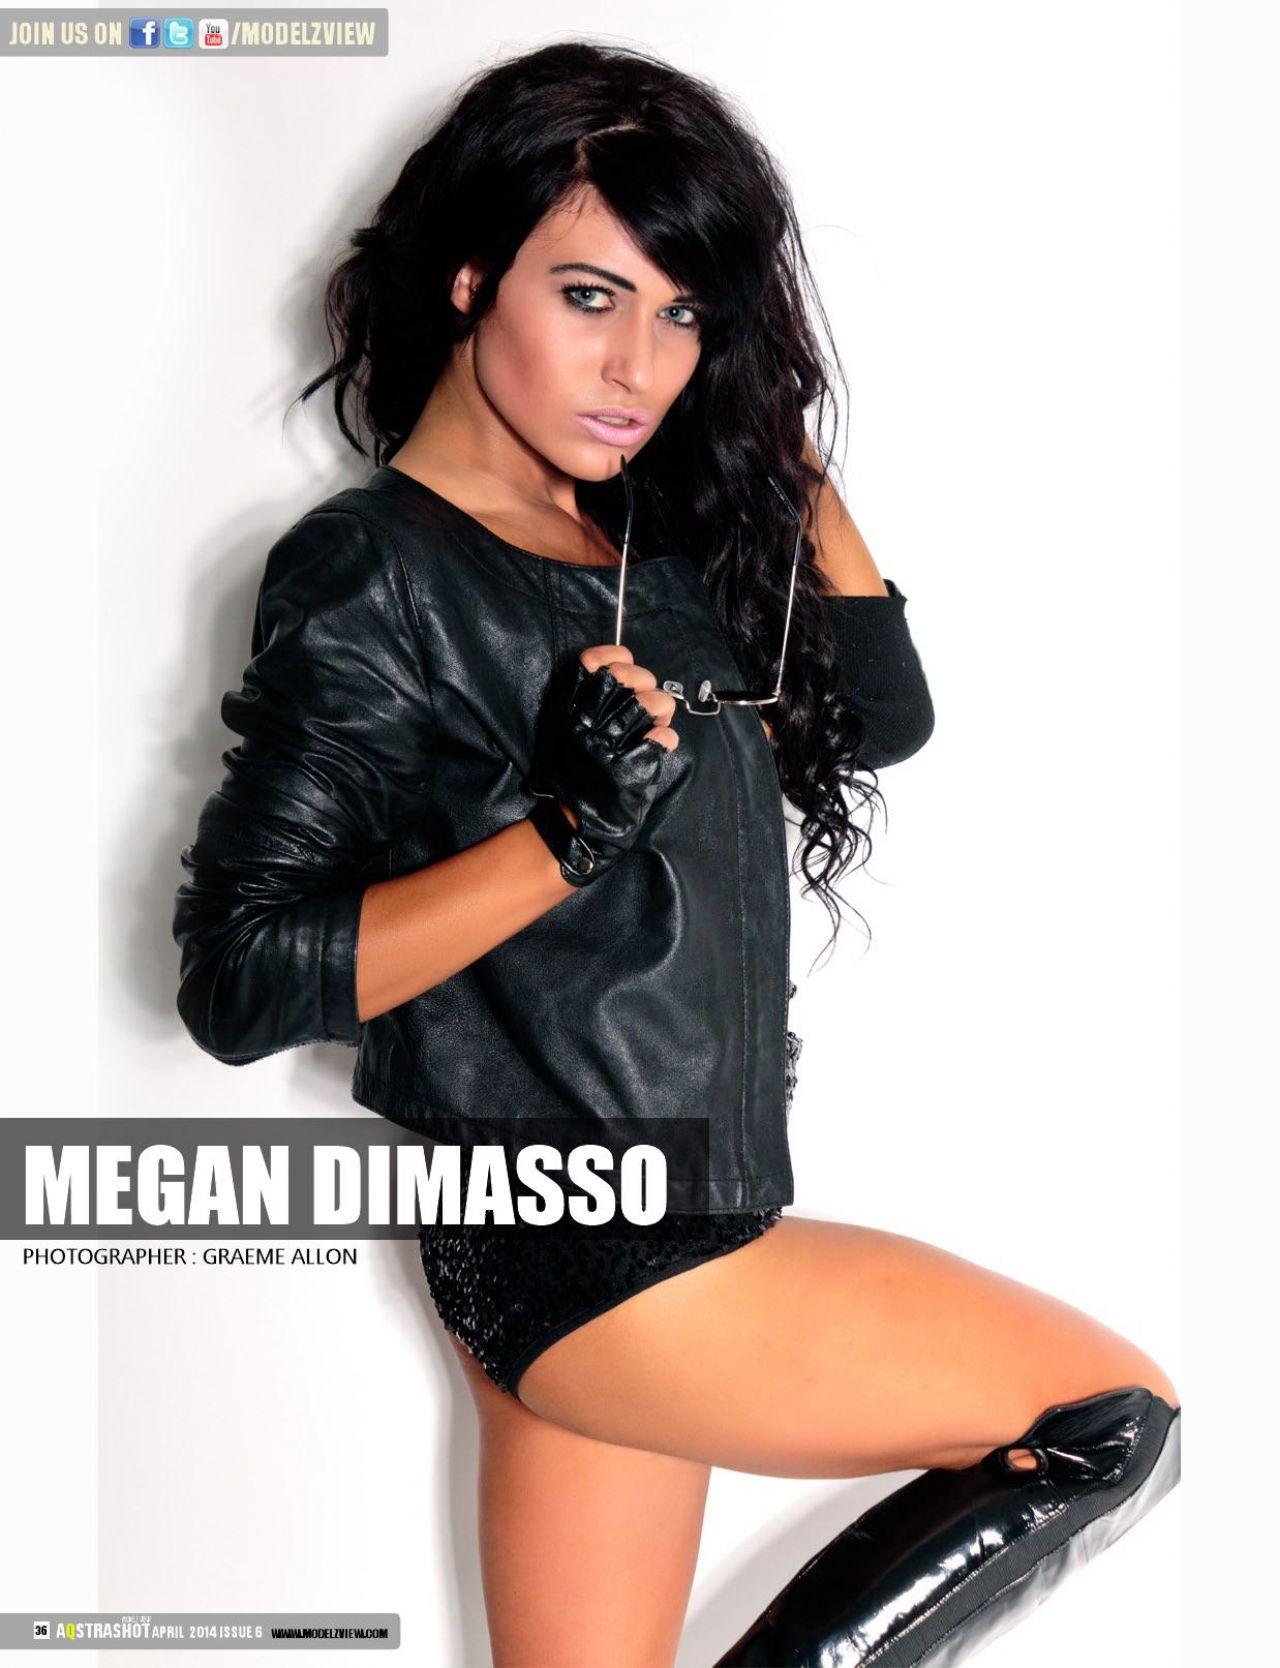 Megan Dimasso – Aqstrashot Magazine April 2014 Issue